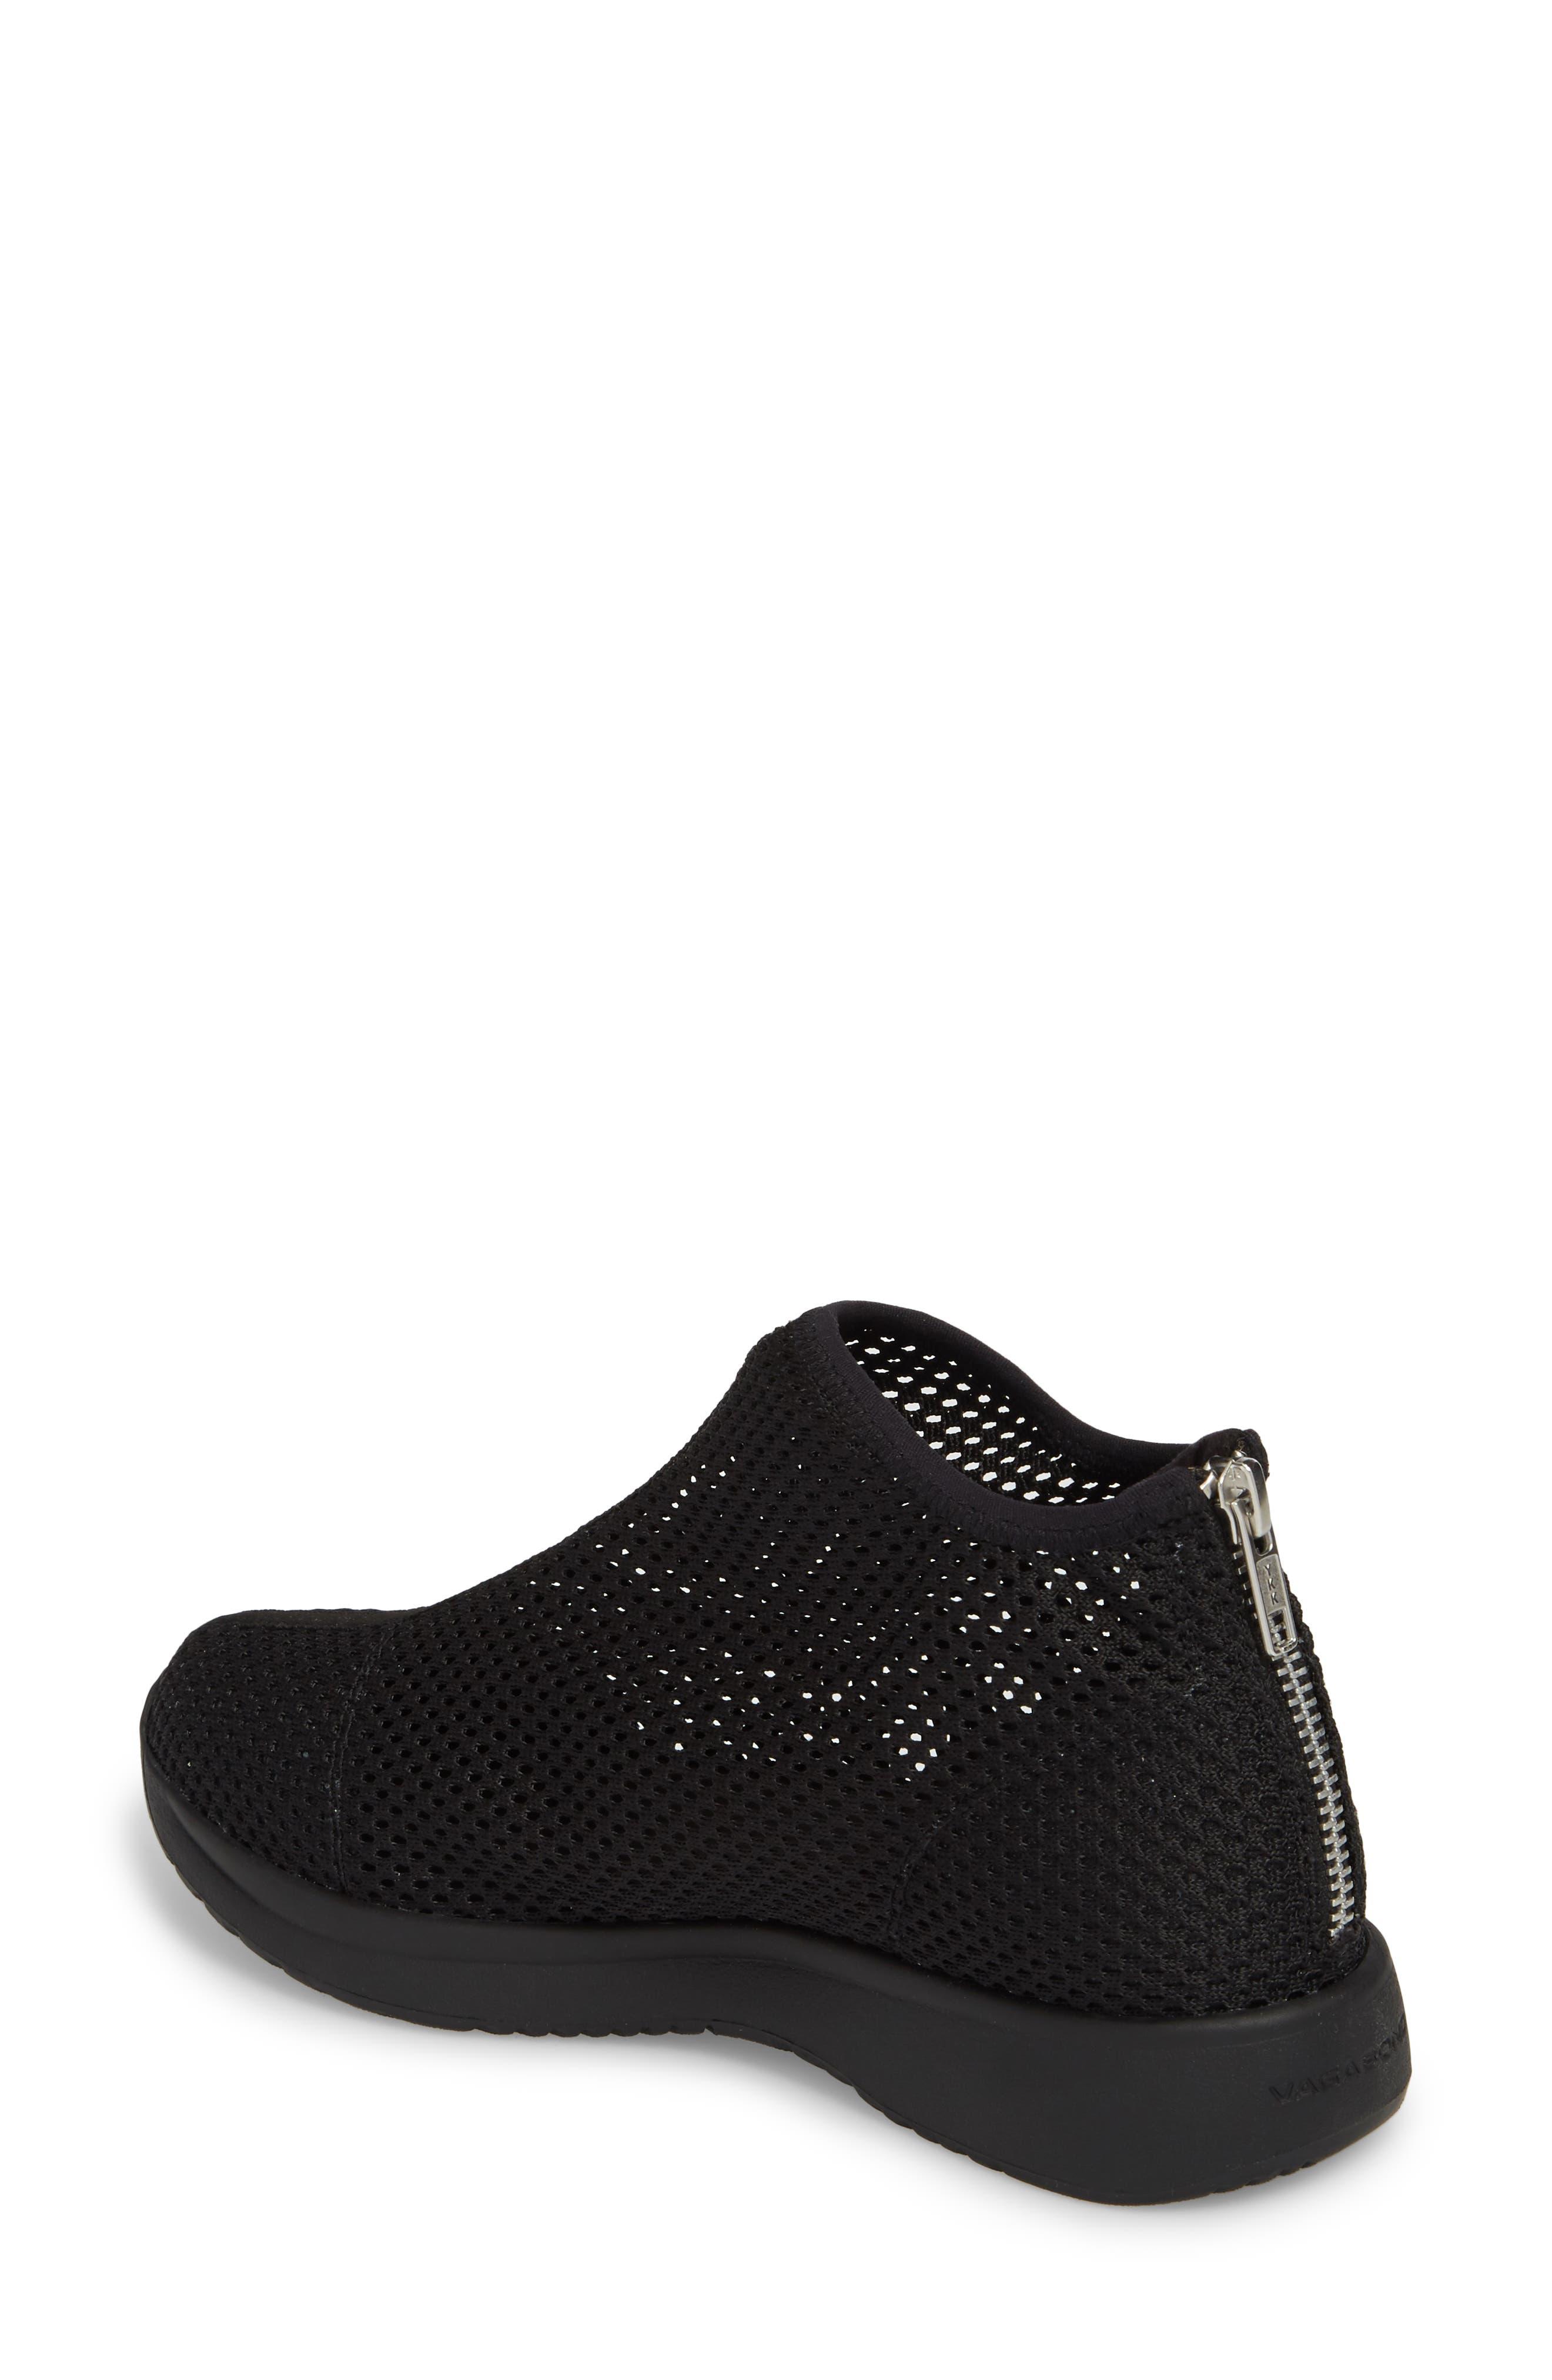 Cintia Sneaker,                             Alternate thumbnail 2, color,                             BLACK FABRIC